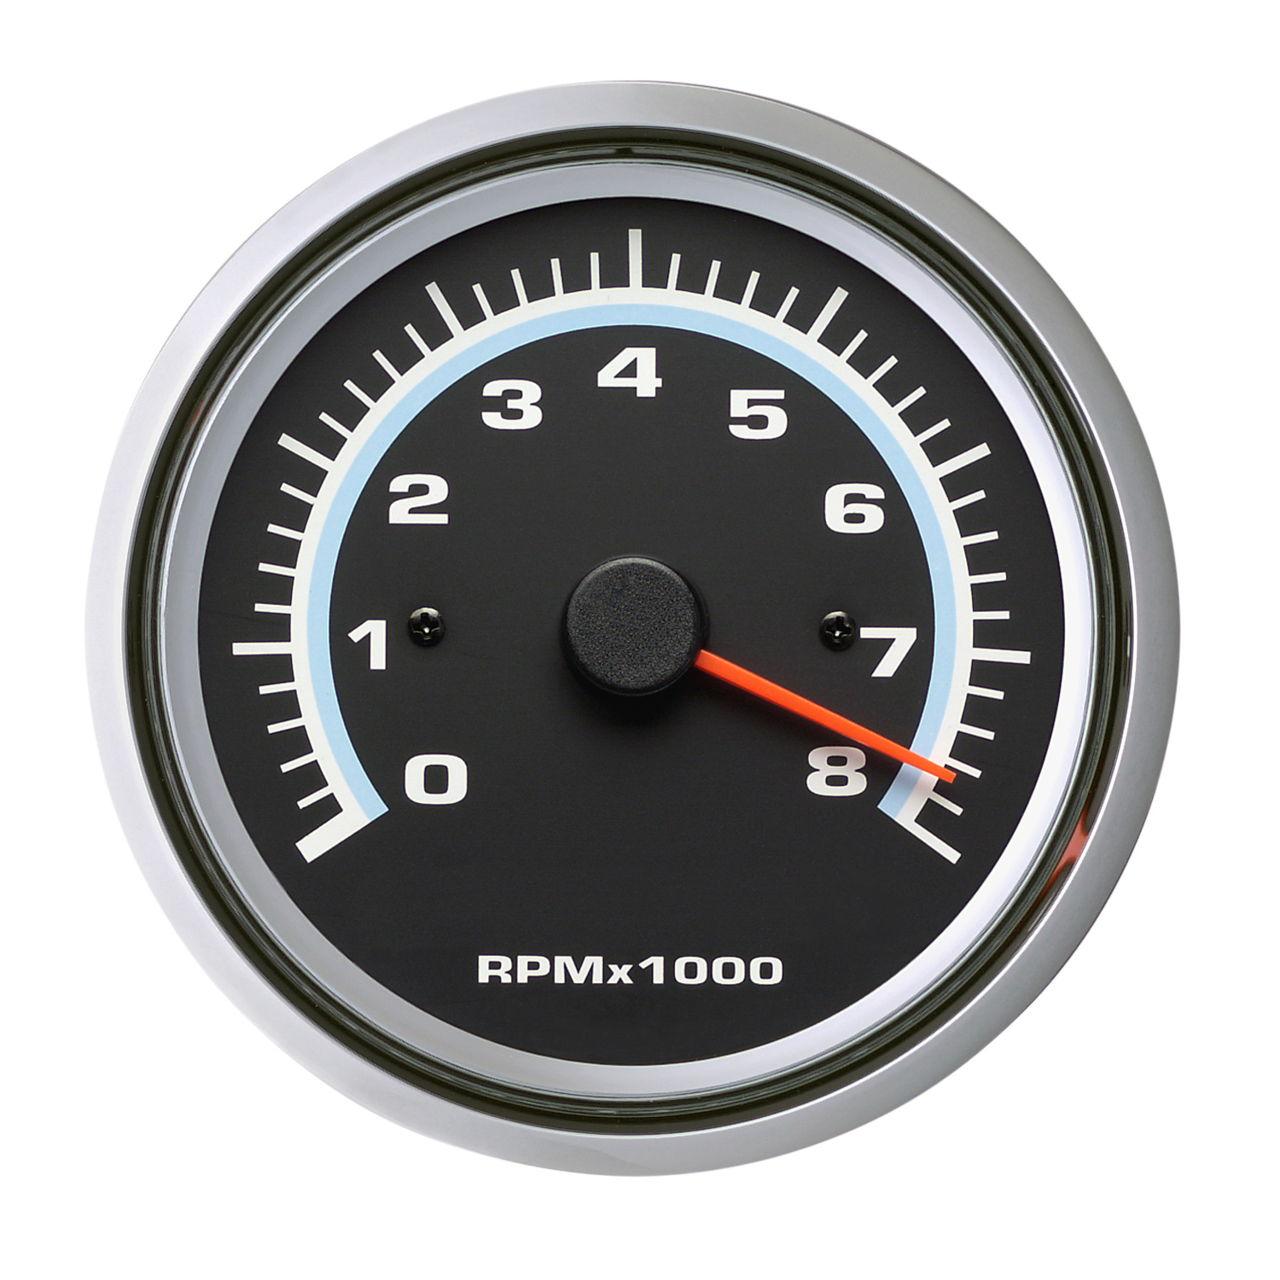 Tachometer Troubleshooting